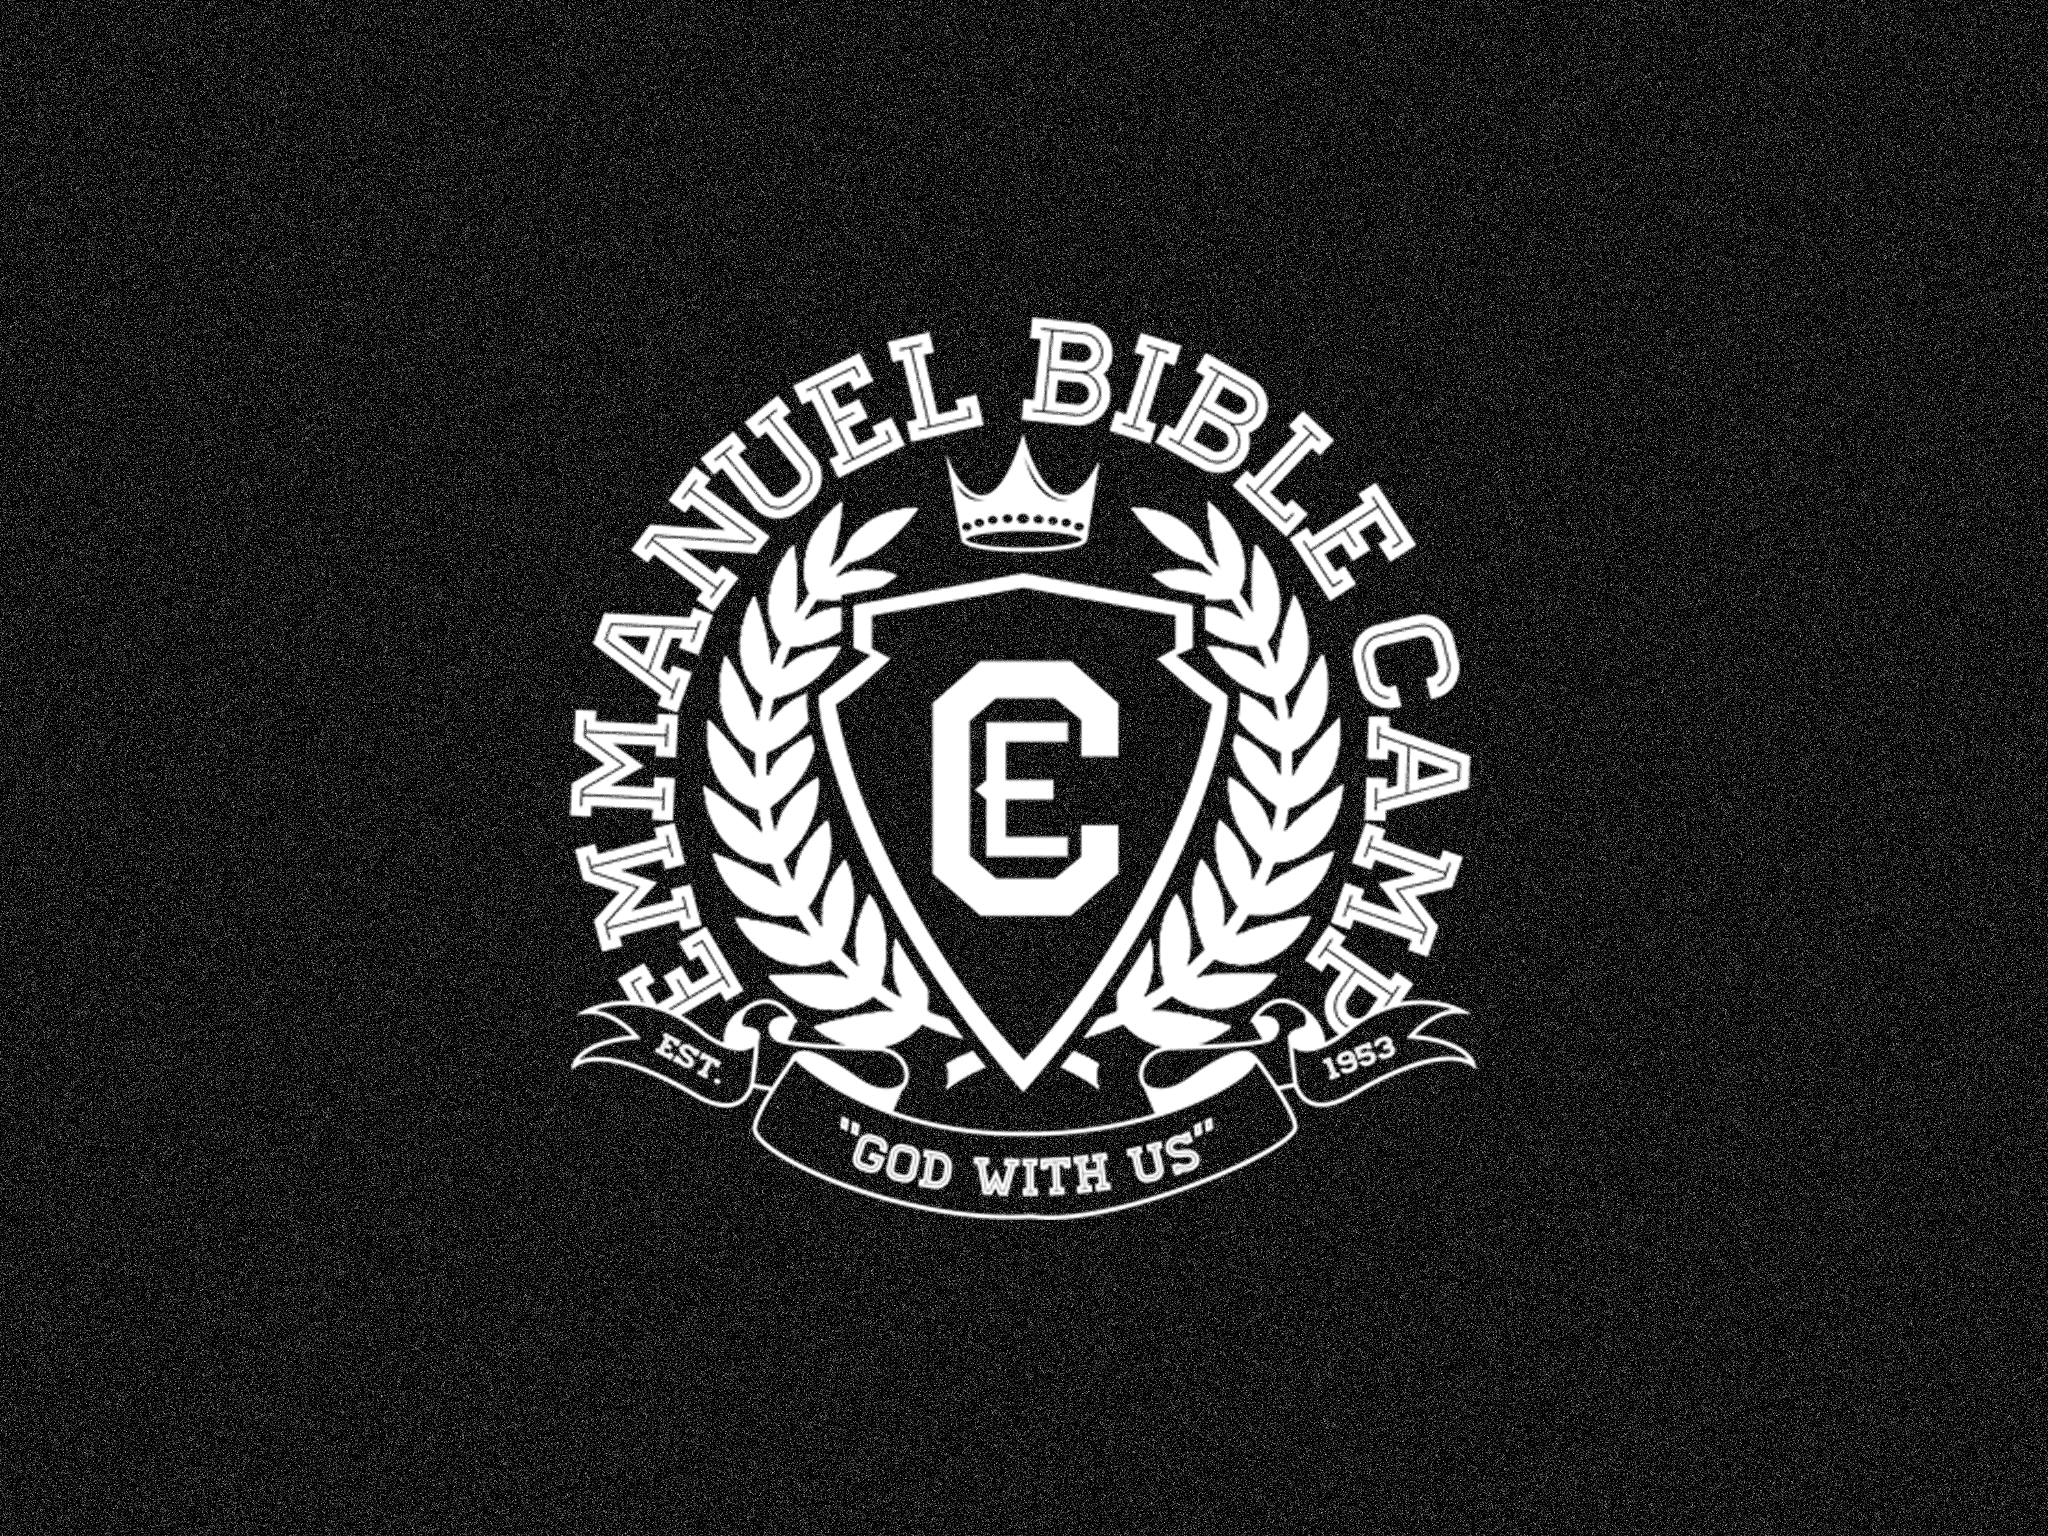 Ebc black